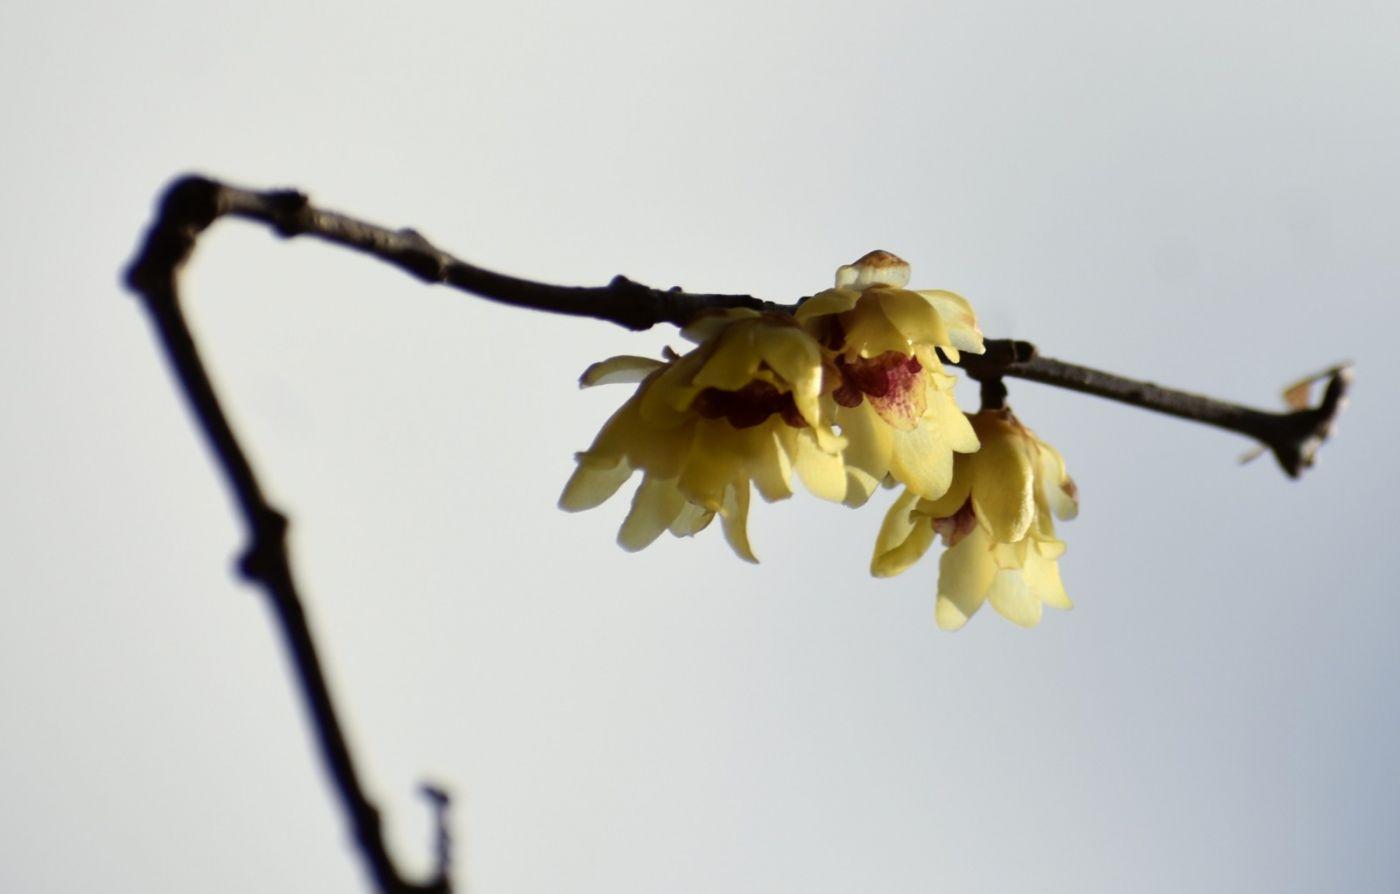 蜡梅_图1-4